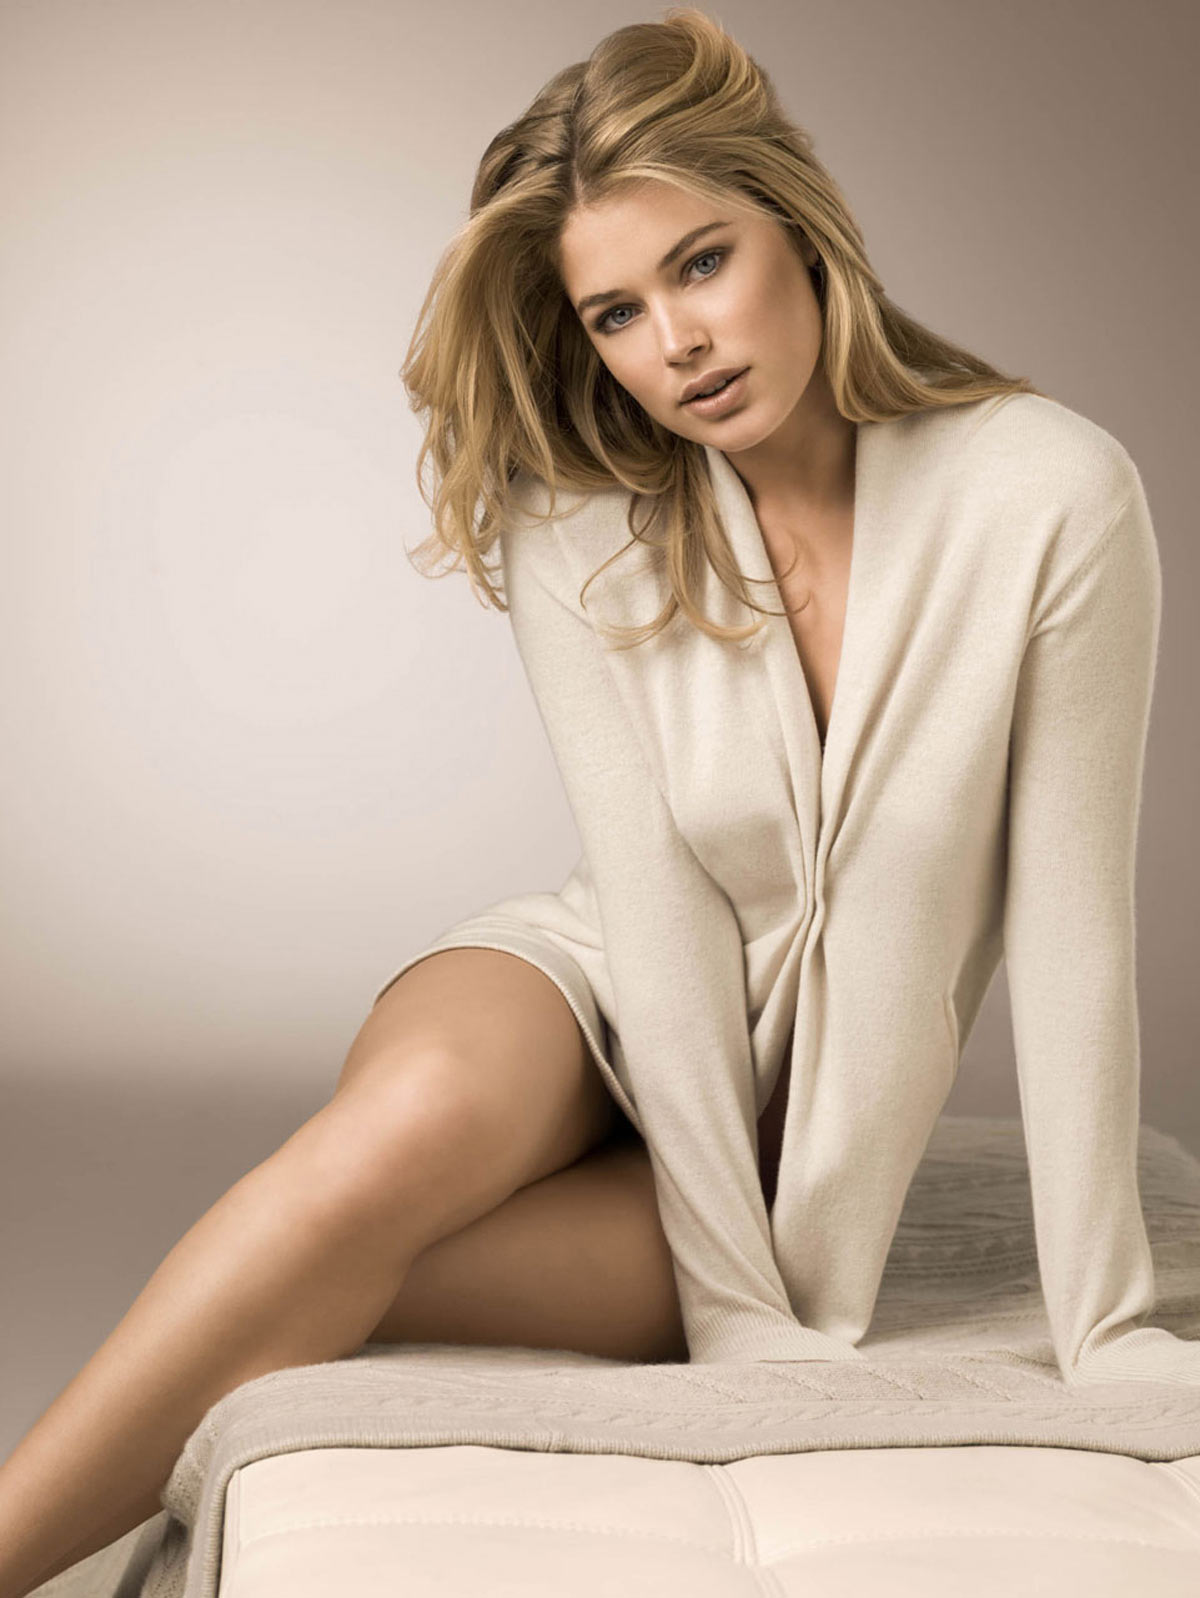 Allwalls: Hot Dutch model and actress Doutzen Kroes